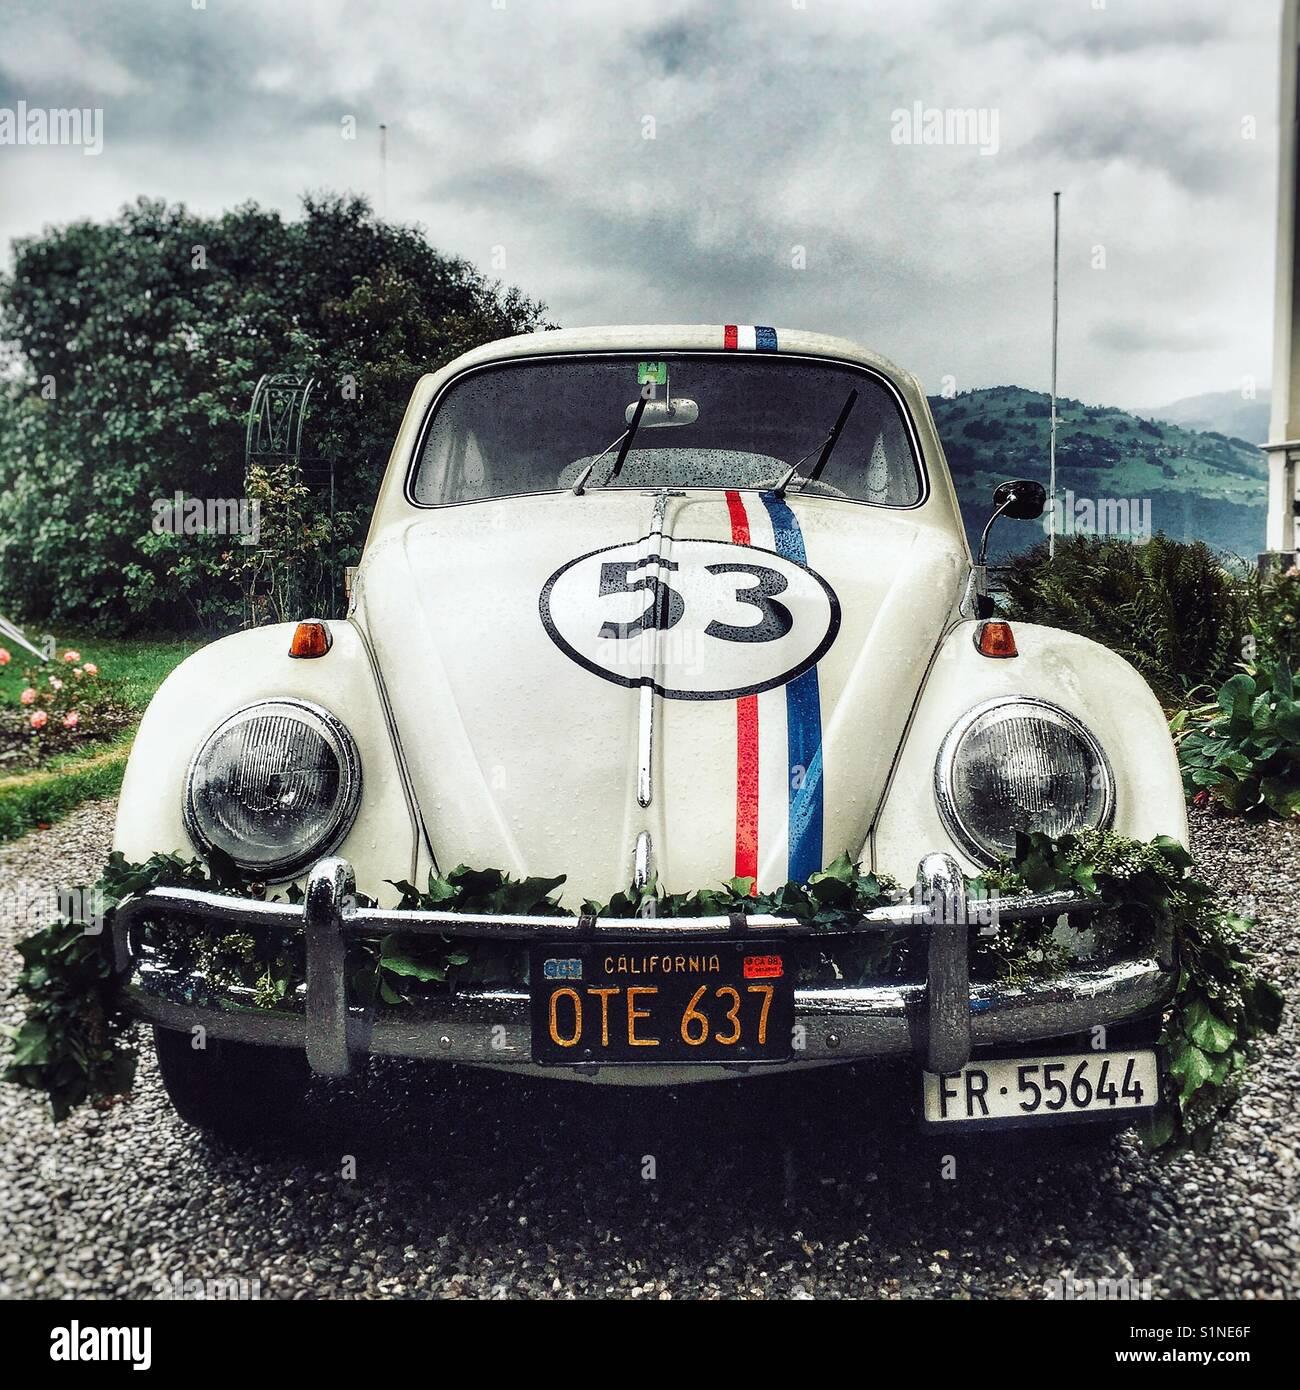 Herbie, VW Beetle used as wedding limo in Switzerland - Stock Image